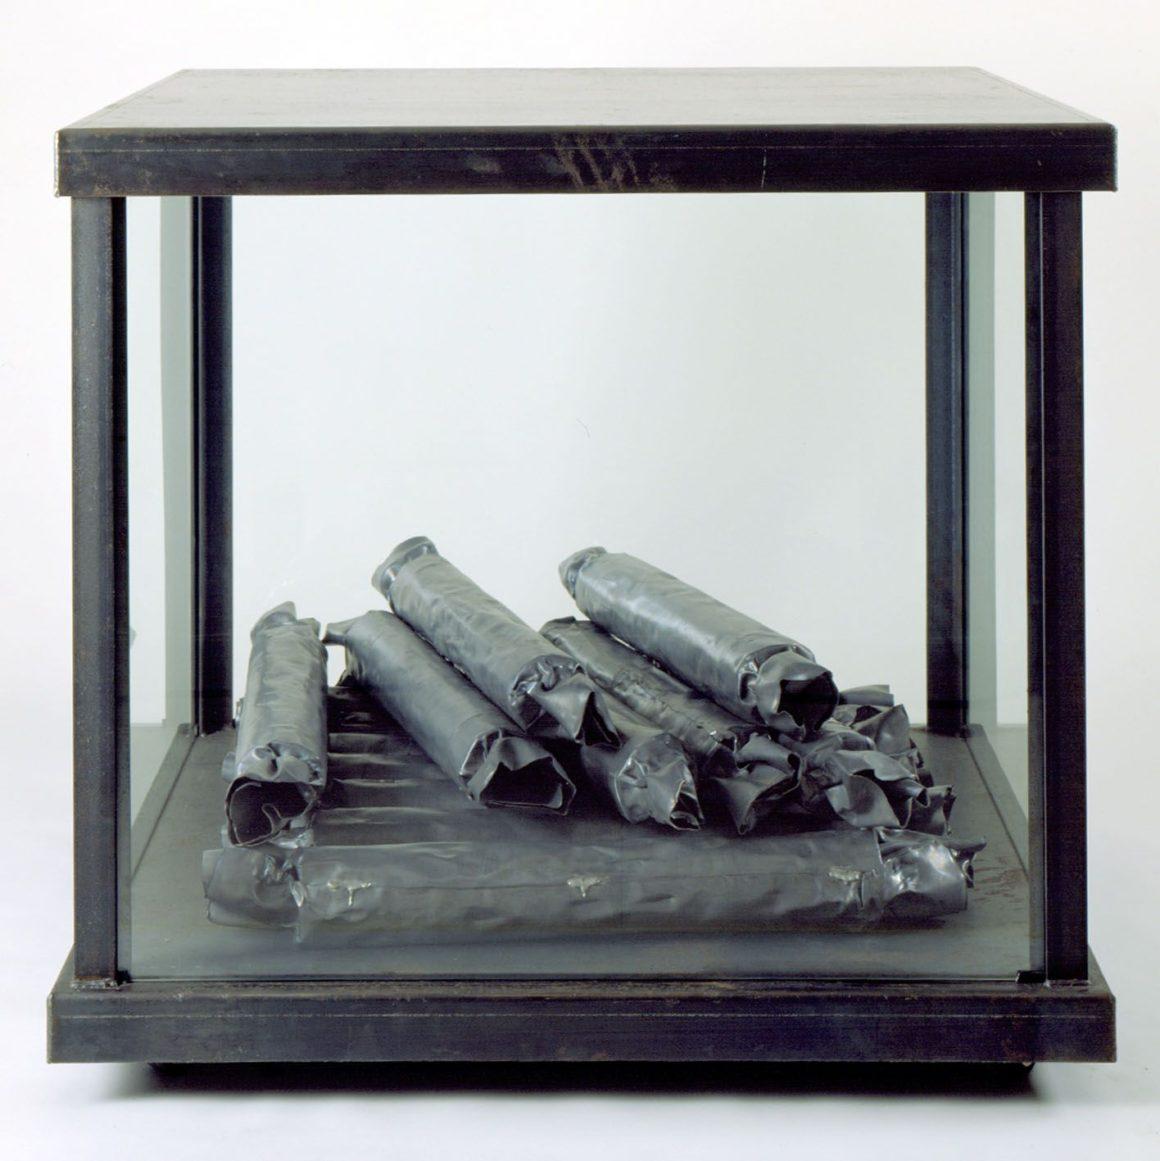 Susana Solano Sweets, 1991 Hierro, plomo y vidrio IVAM, Institut Valencià d'Art Modern. Generalitat.